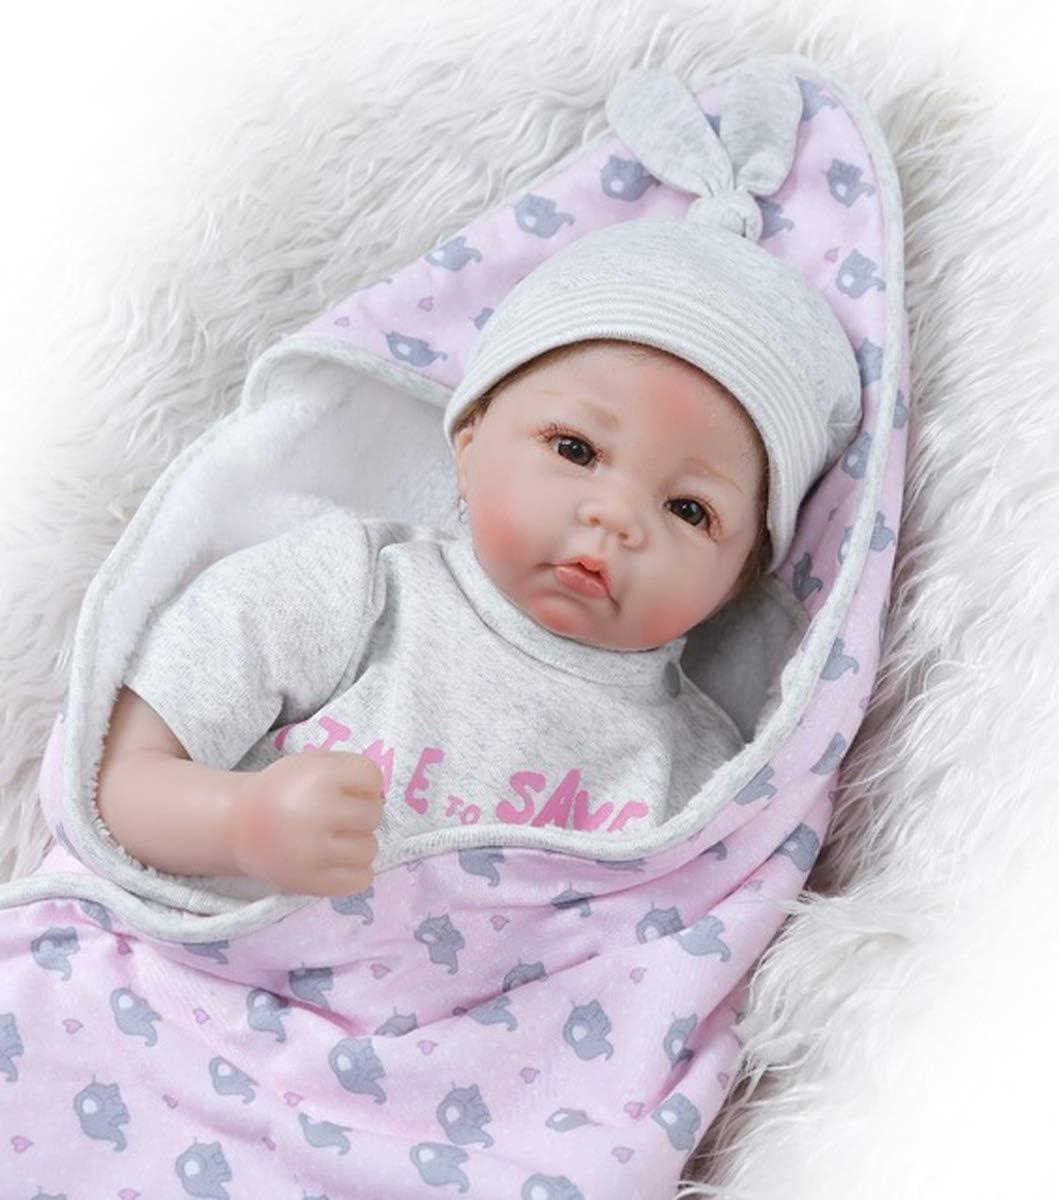 TERABITHIA 20inch 50cm Truly Handmade Little Sweetheart Ranking TOP3 My Over item handling ☆ Rebor